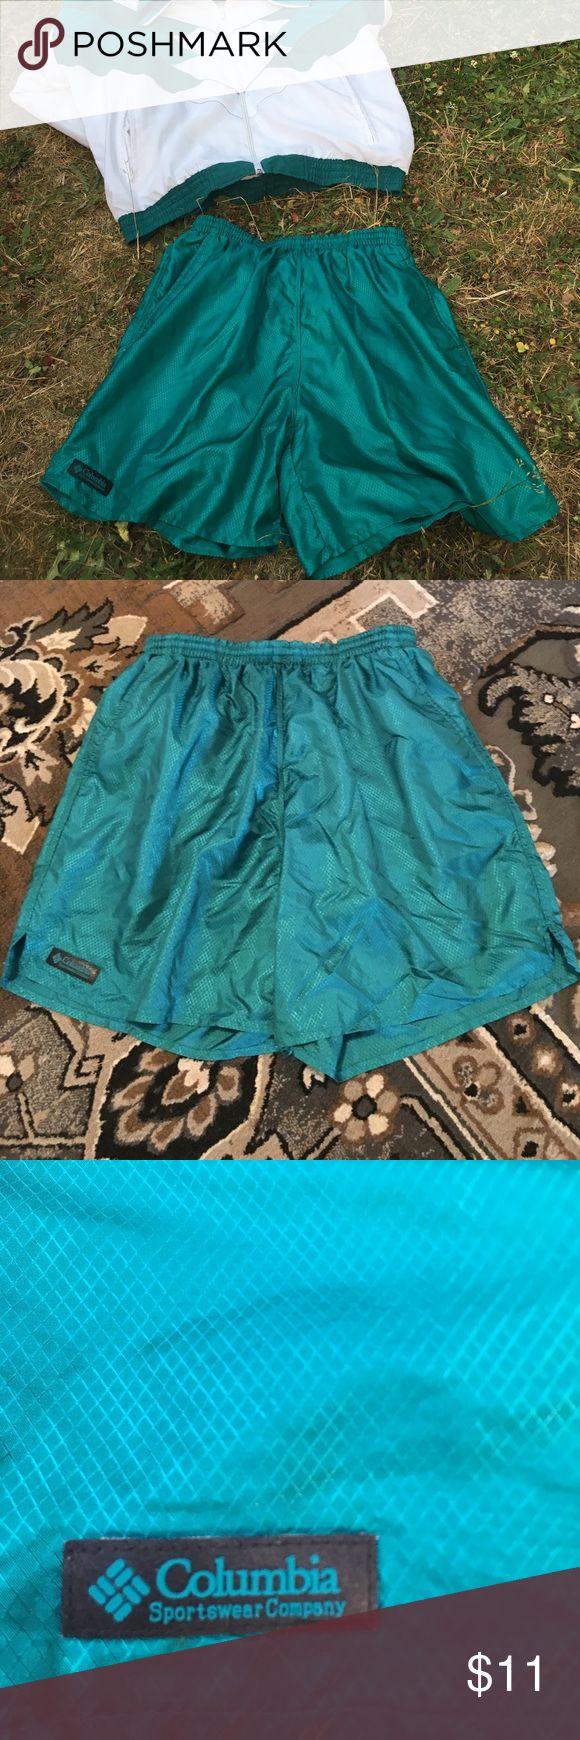 Vintage Columbia activewear turquoise shorts Columbia mesh vintage running shorts Columbia Shorts Athletic